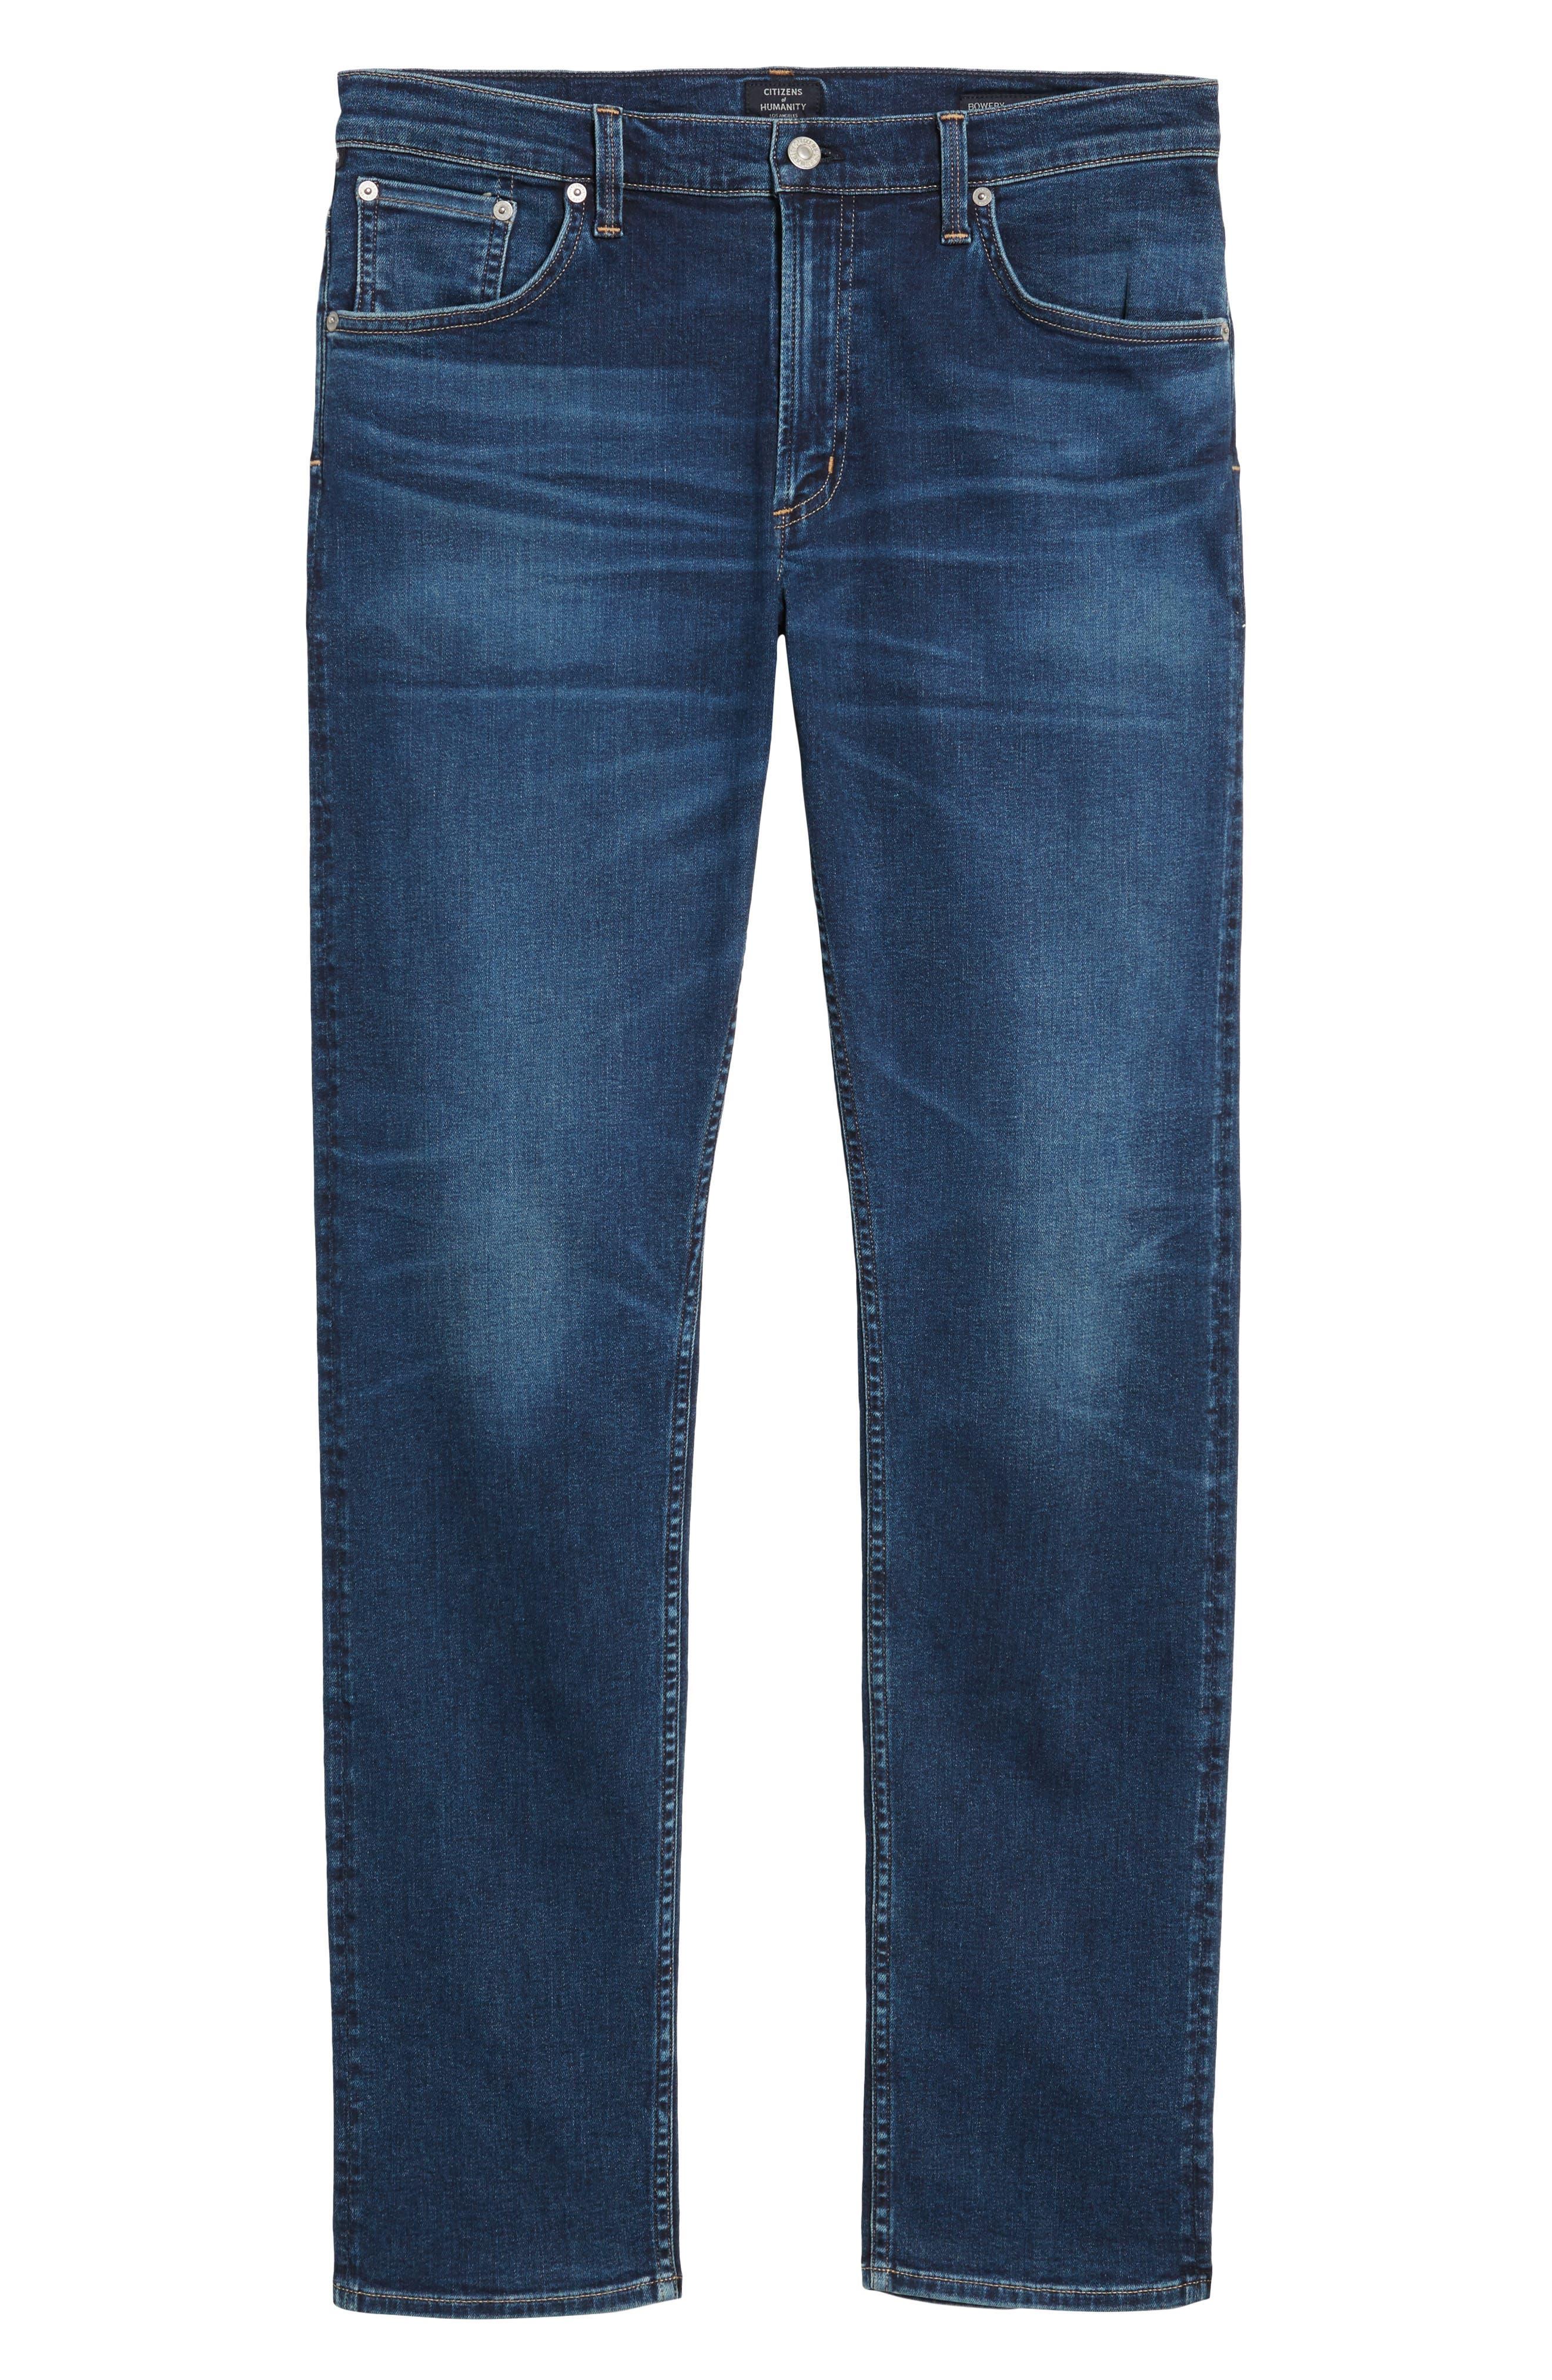 PERFORM - Gage Slim Straight Leg Jeans,                             Alternate thumbnail 6, color,                             Turner